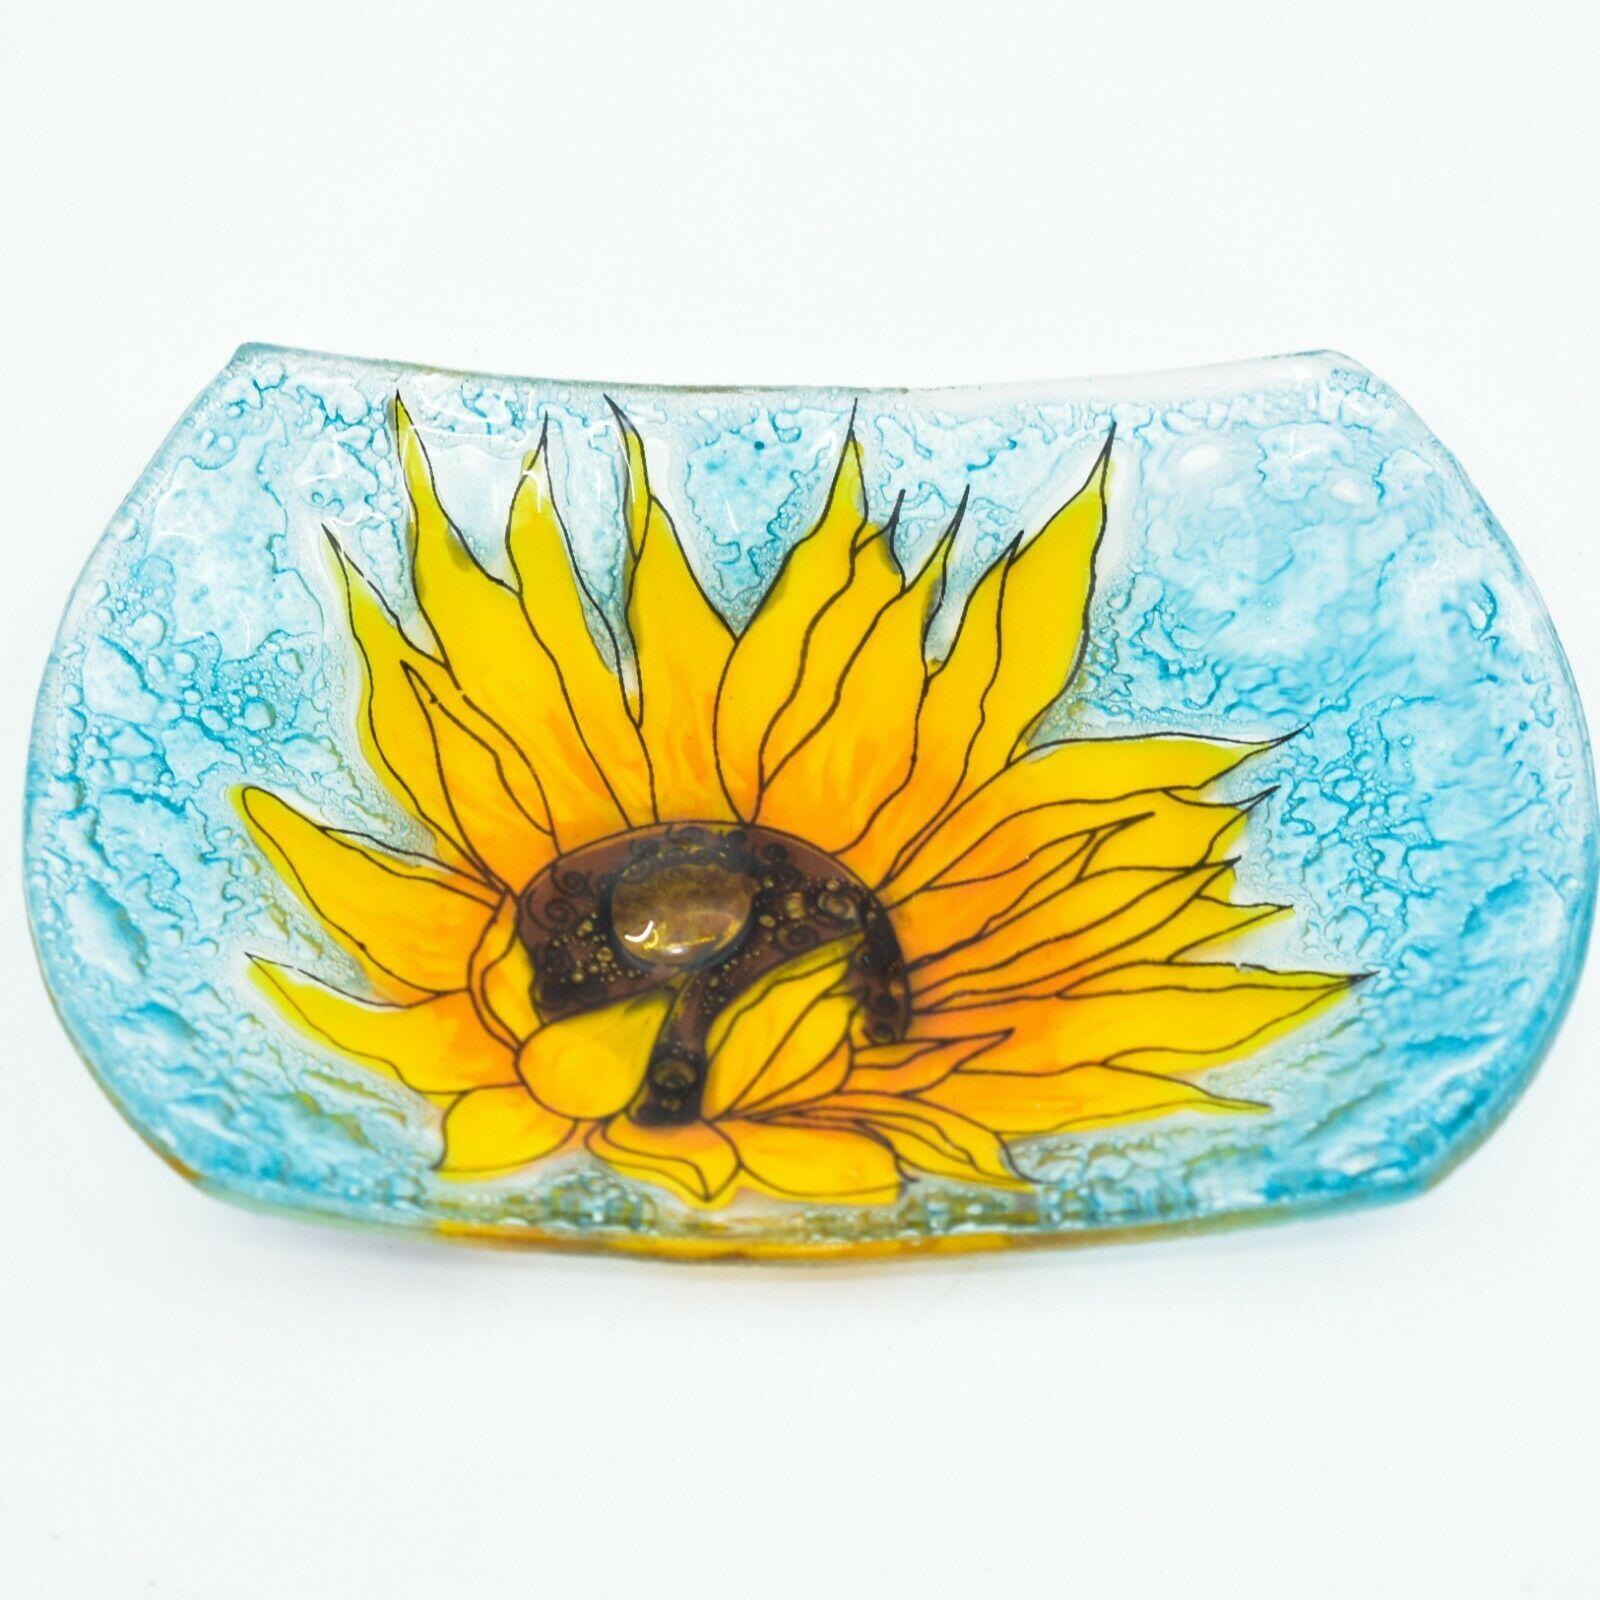 Fused Art Glass Sunflower Flower Design Soap Dish Handmade Ecuador